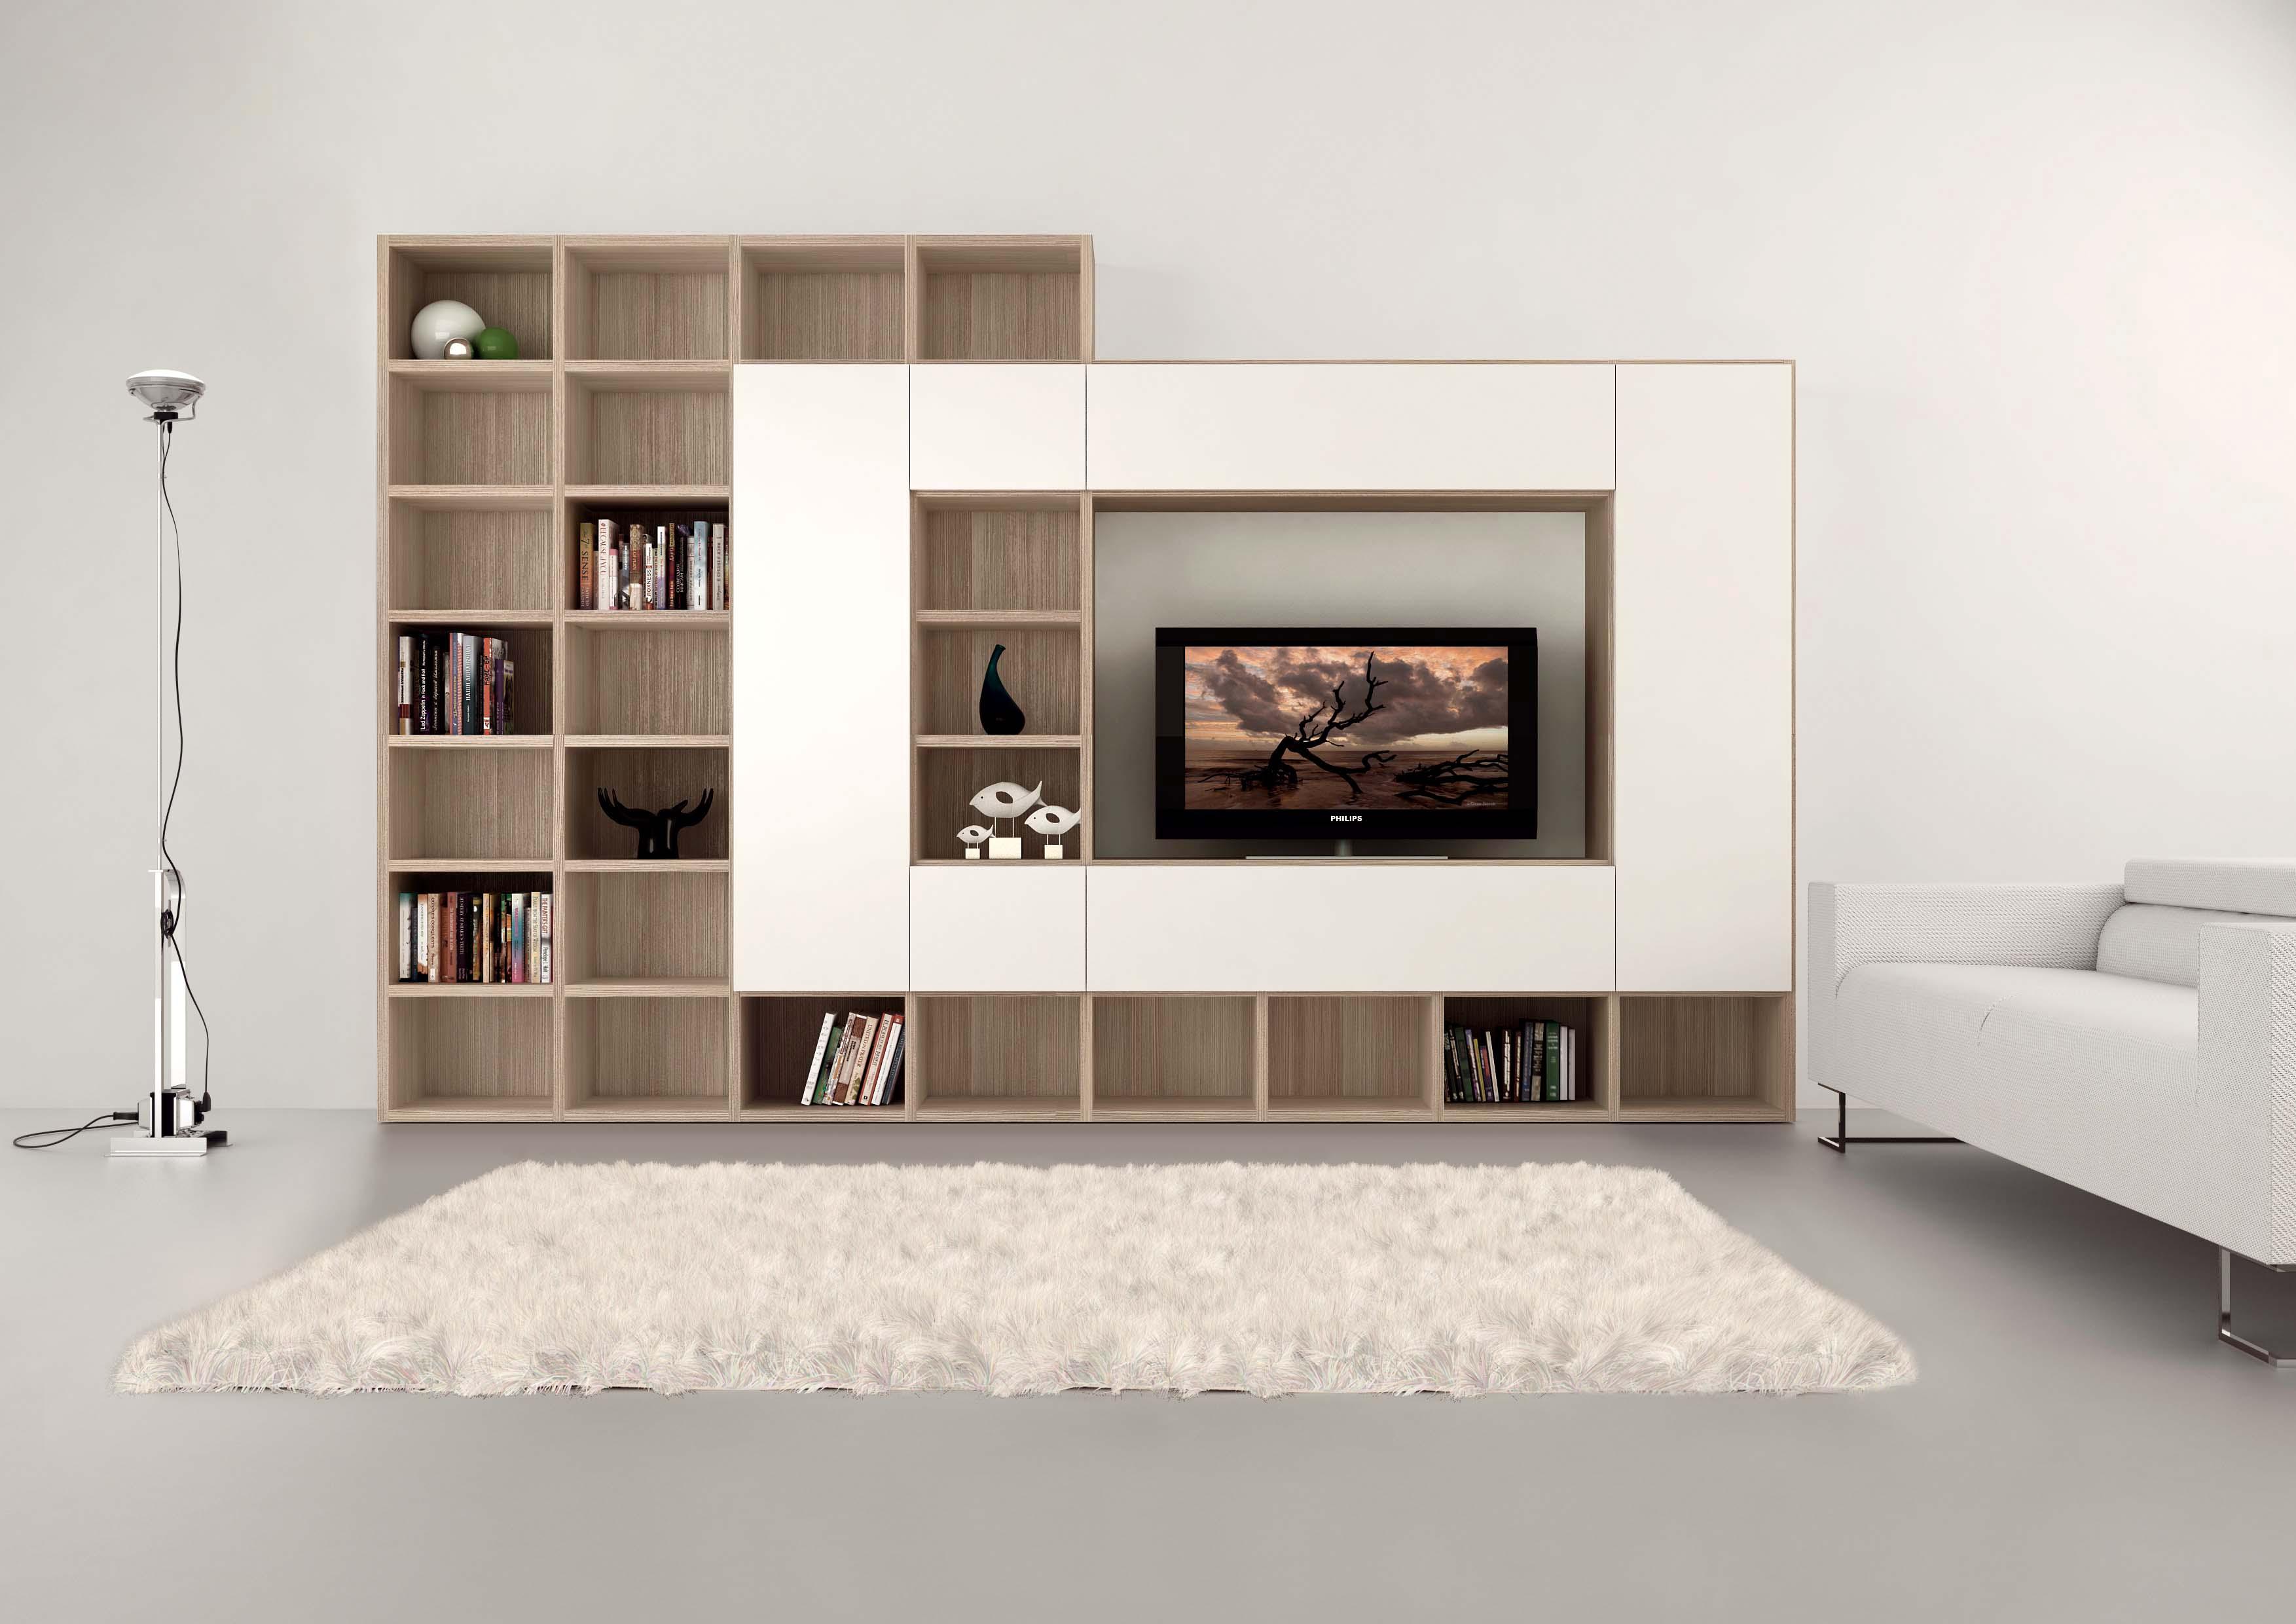 Ikea Kasten In Elkaar Laten Zetten Met Montageservice Tgwonen